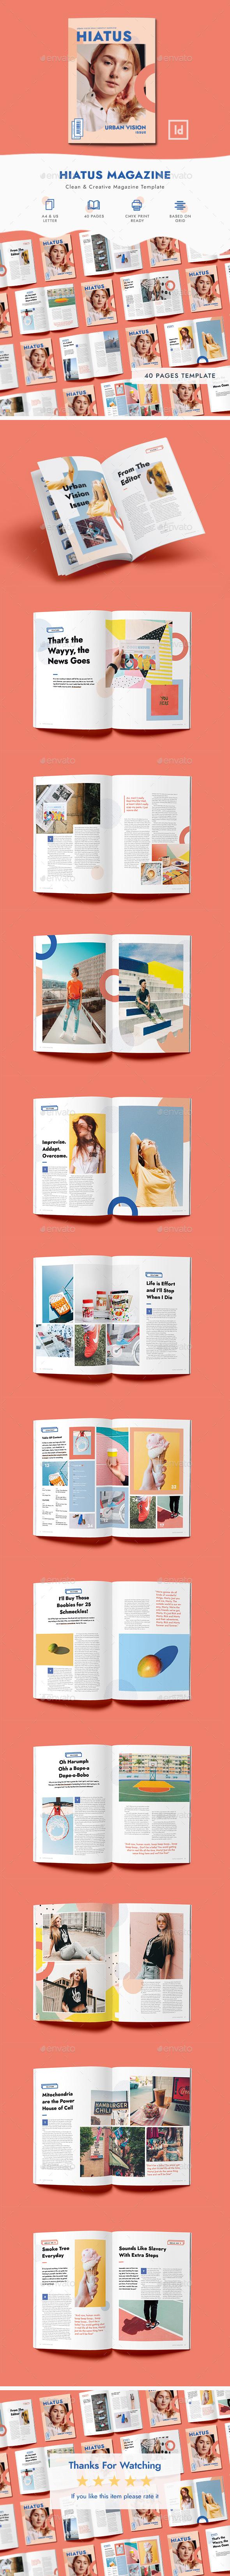 Hiatus Magazine Template - Magazines Print Templates